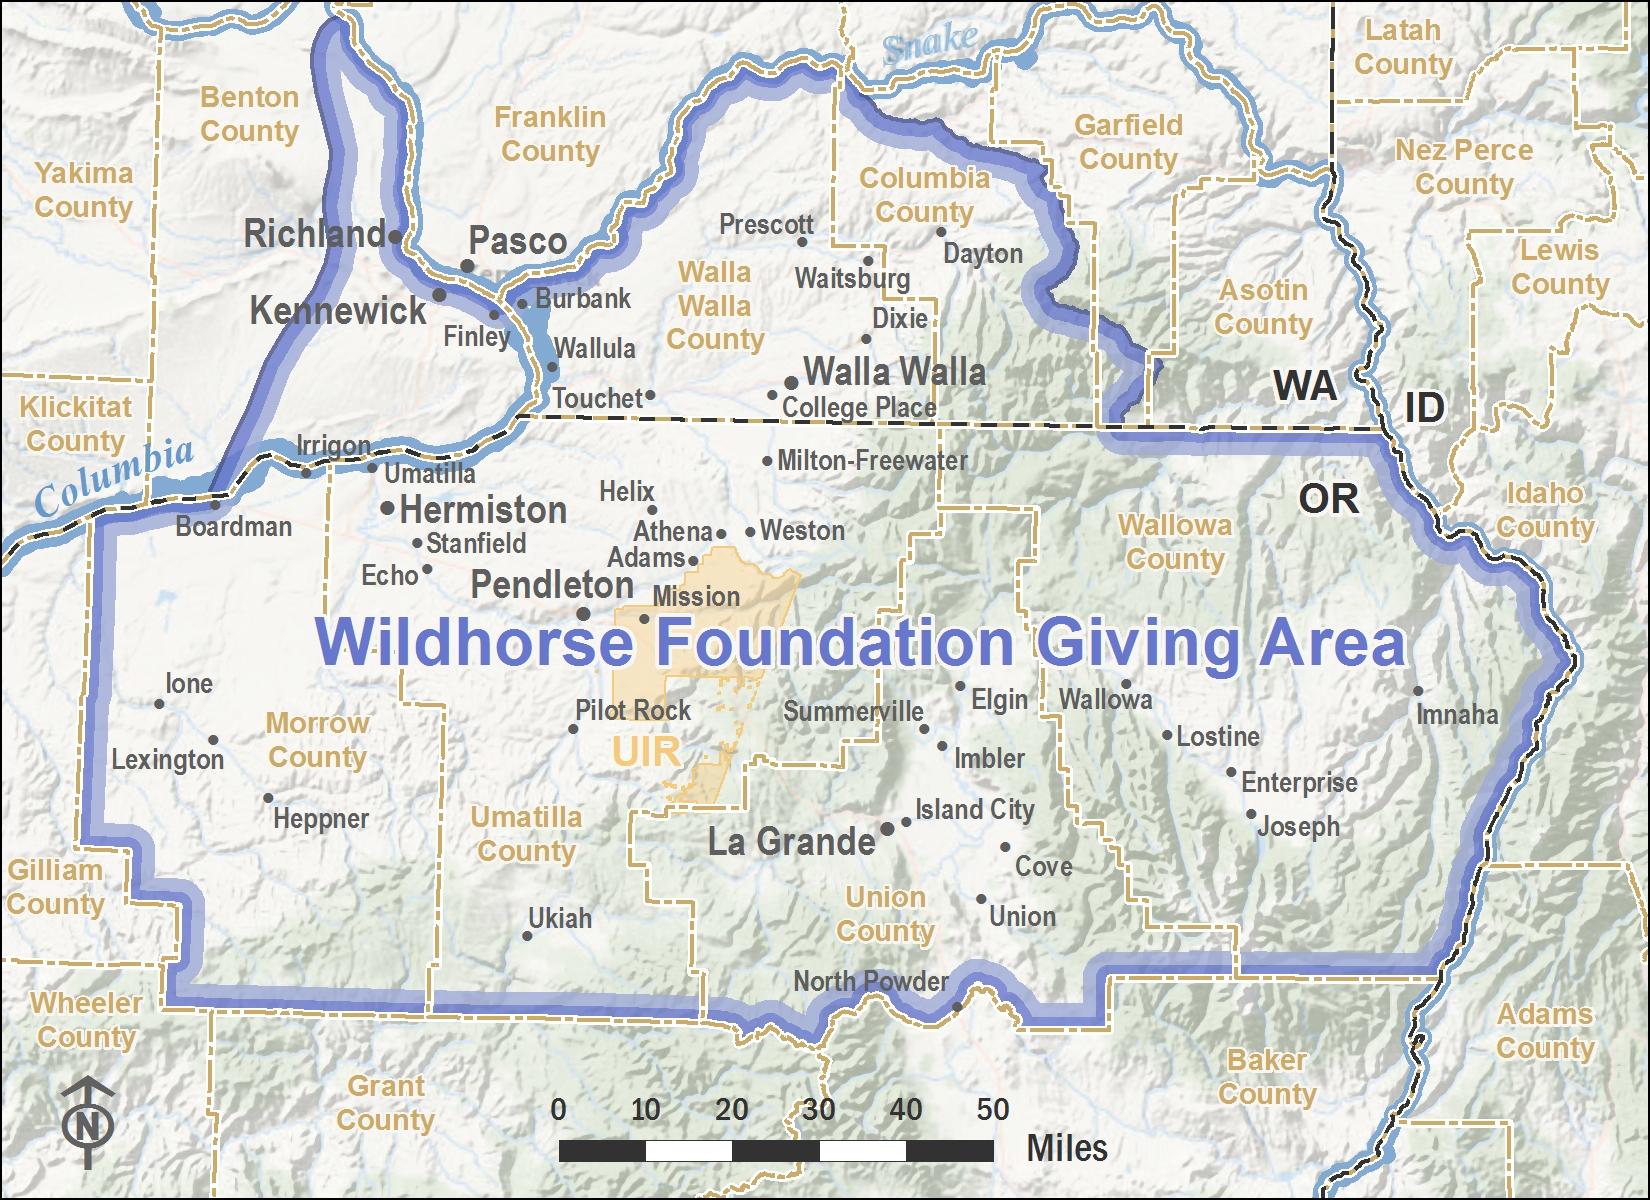 Guidelines – Wildhorse Foundation